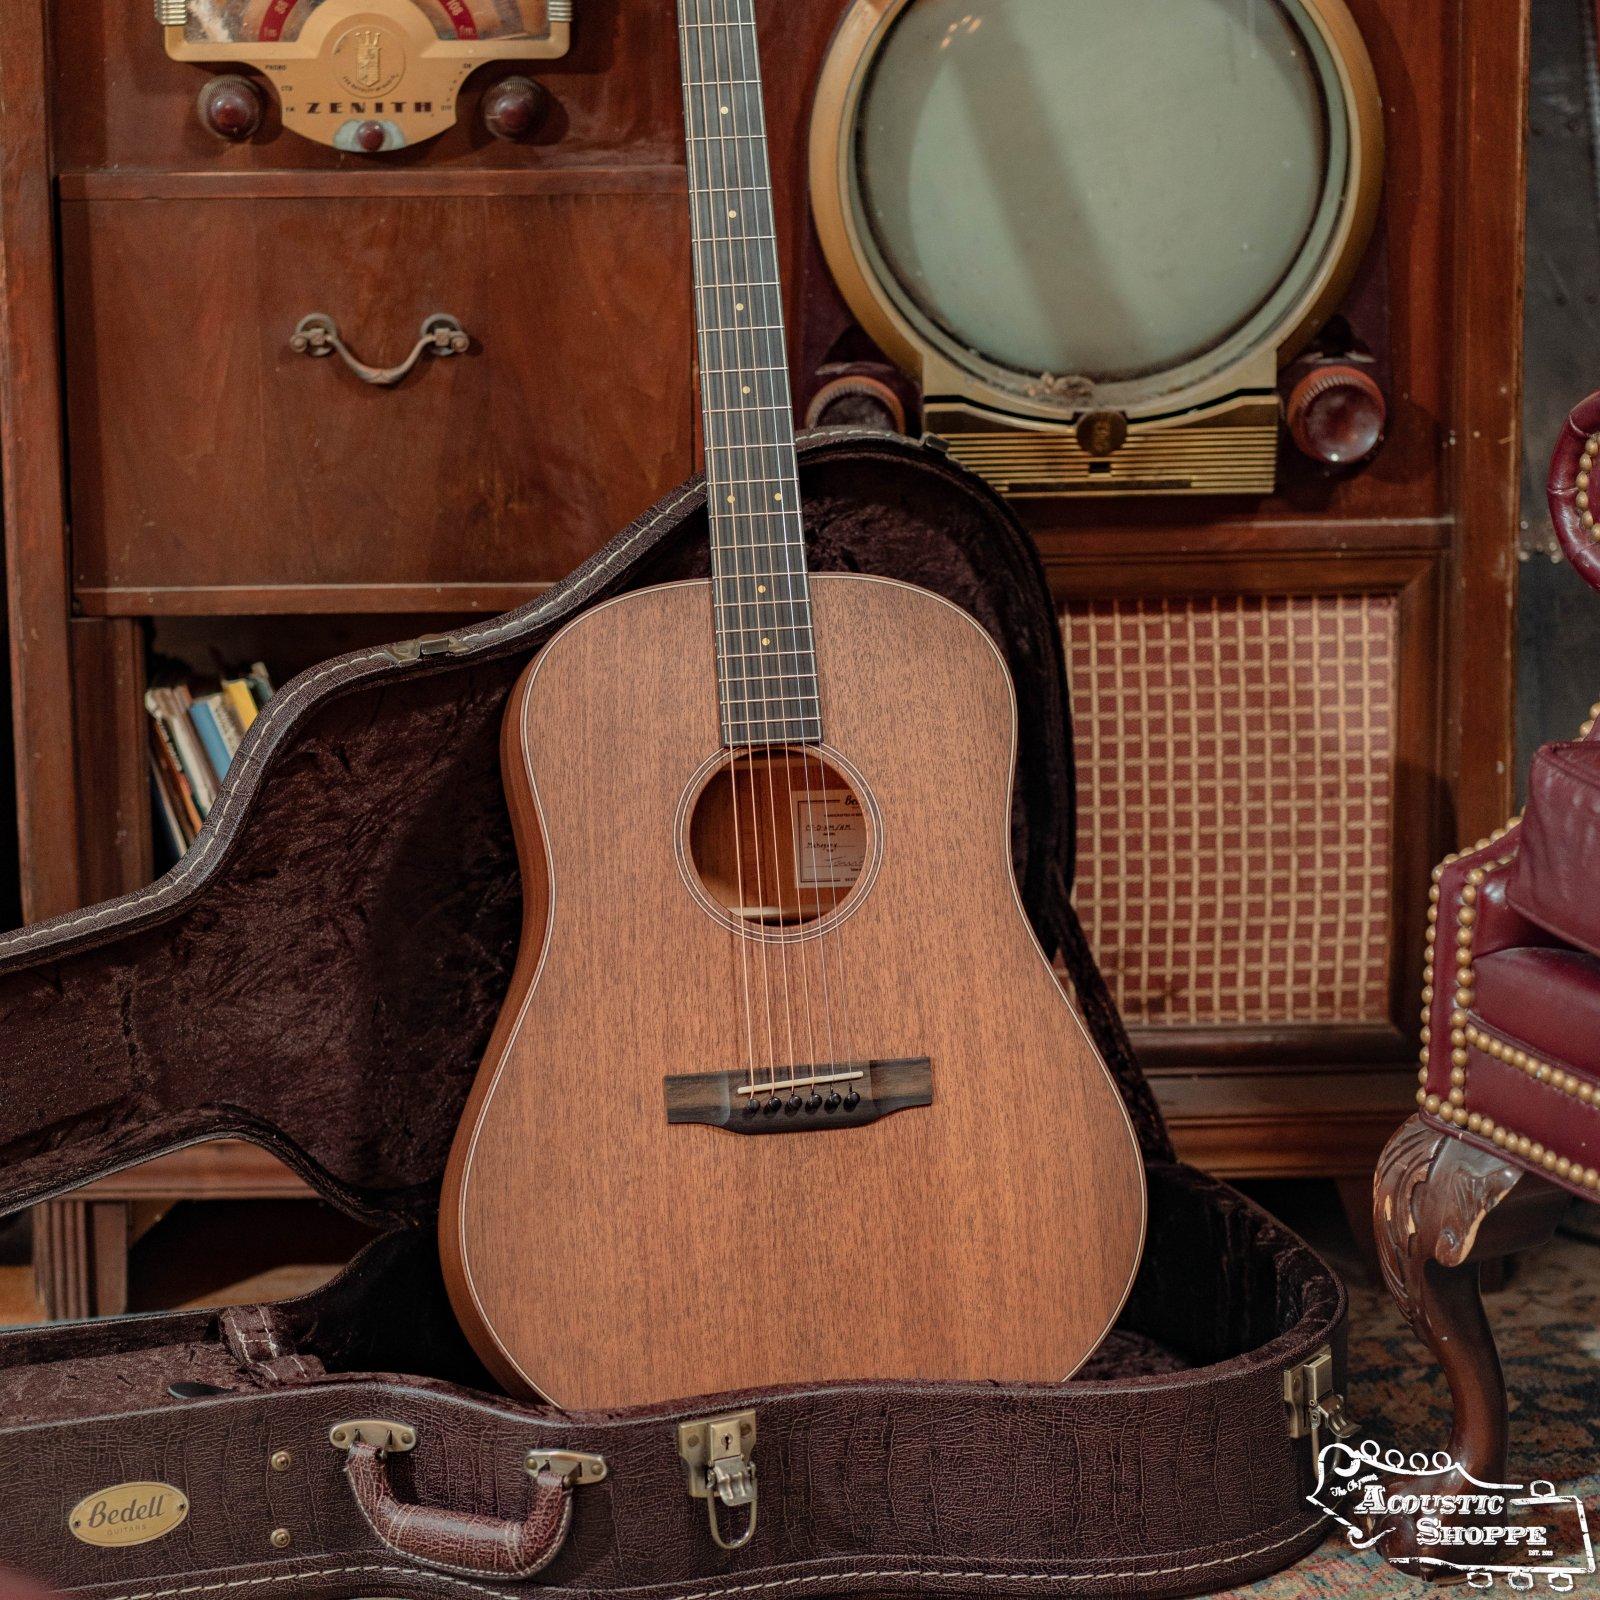 Bedell Classic Folk Dreadnought Acoustic All Mahogany w/ K&K Pickup #8014